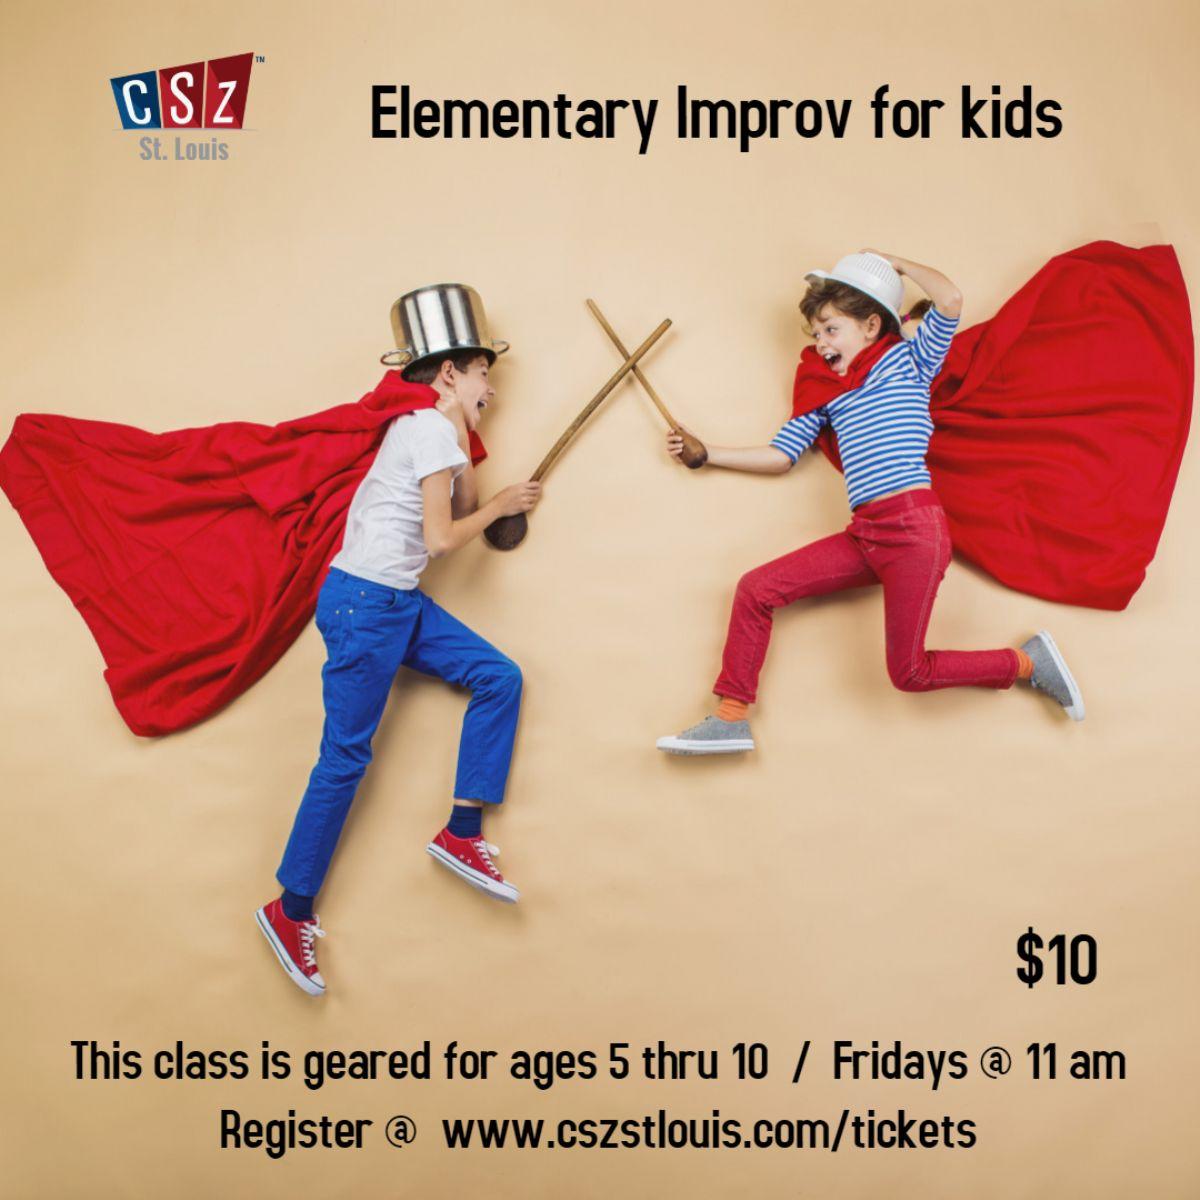 Elementary Improv for Kids - Virtual class